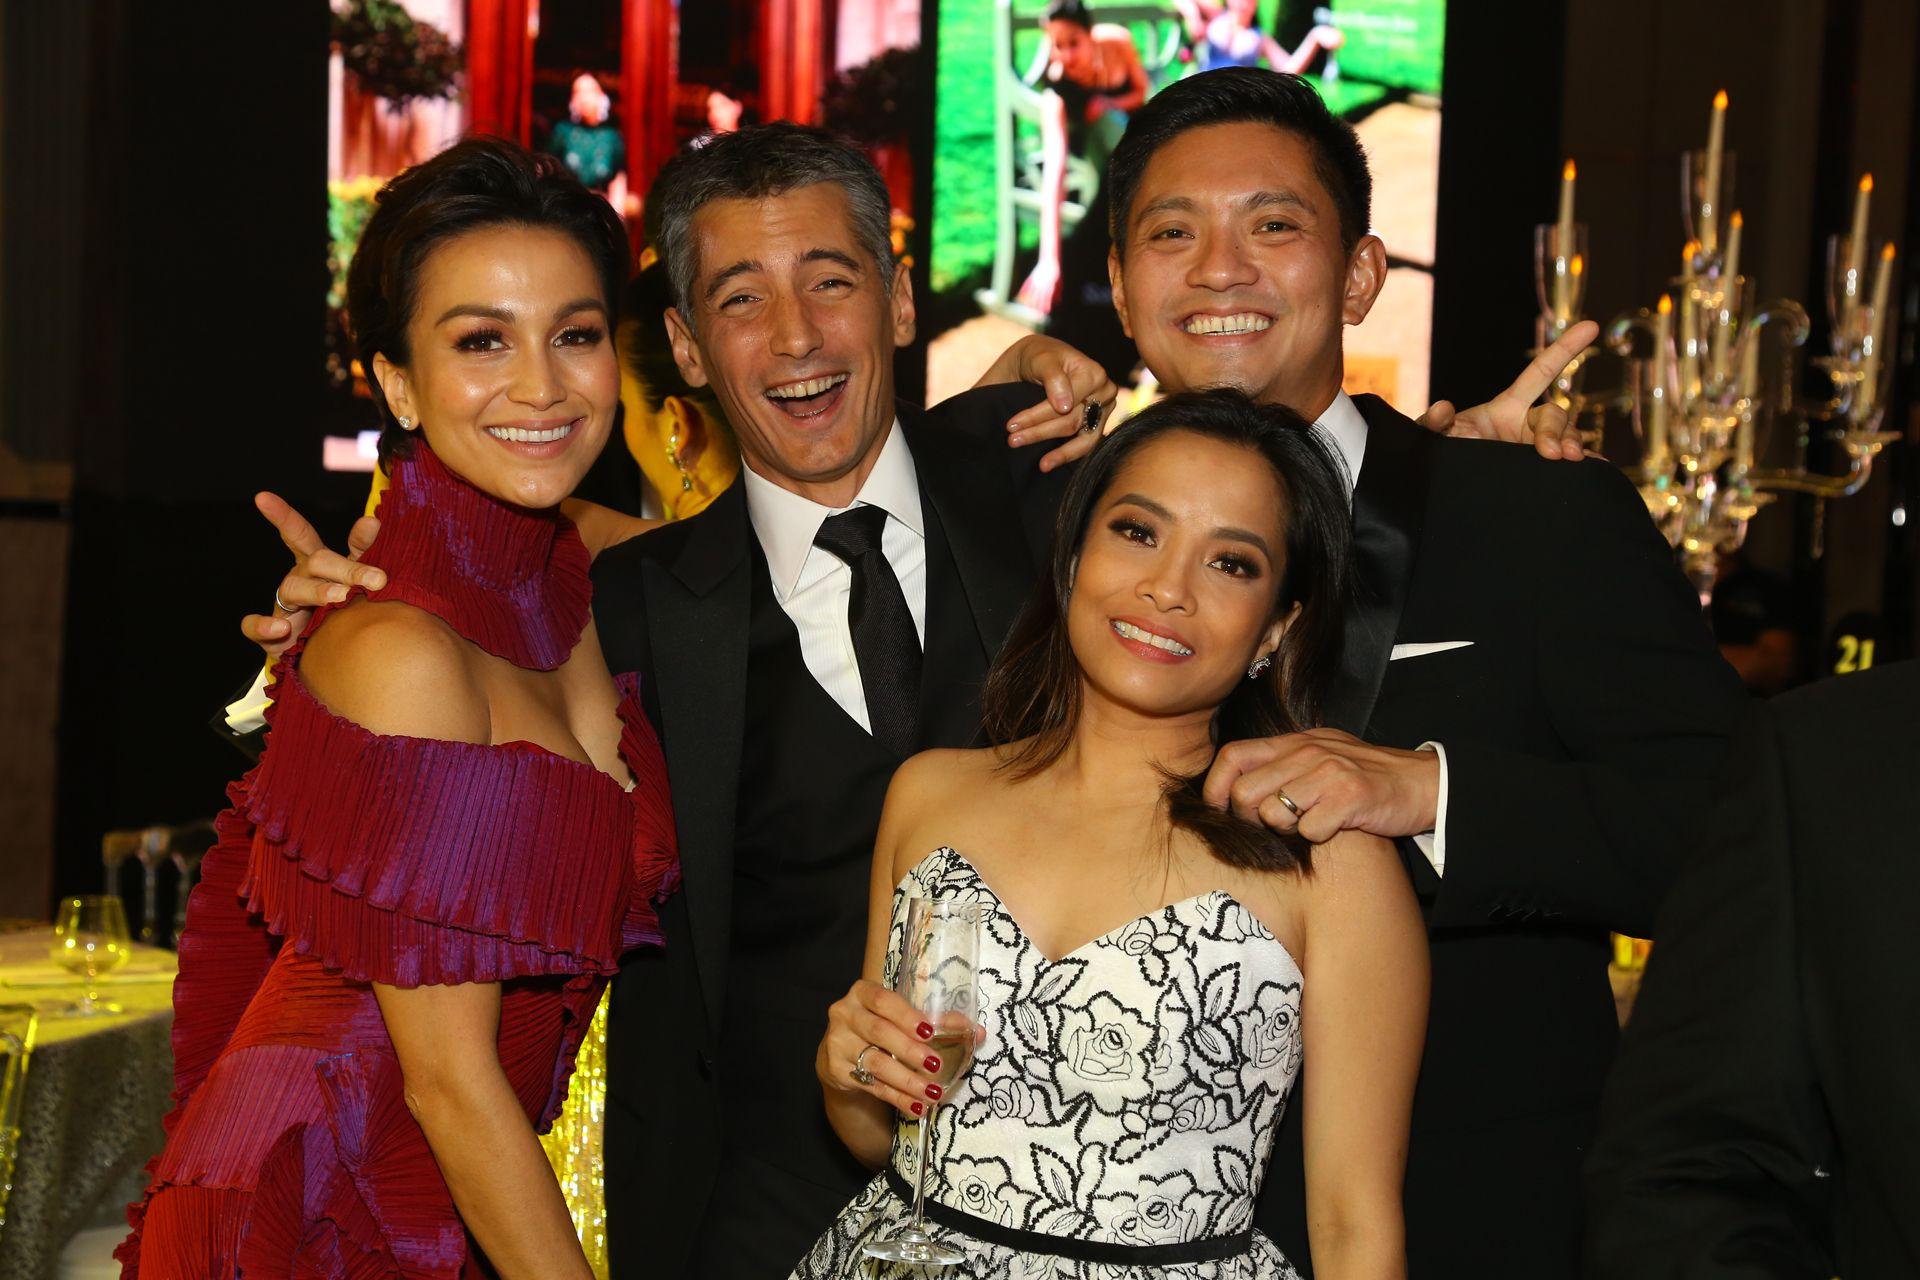 Stephanie and Christian Gonzalez with Tina and Carey Lagdameo